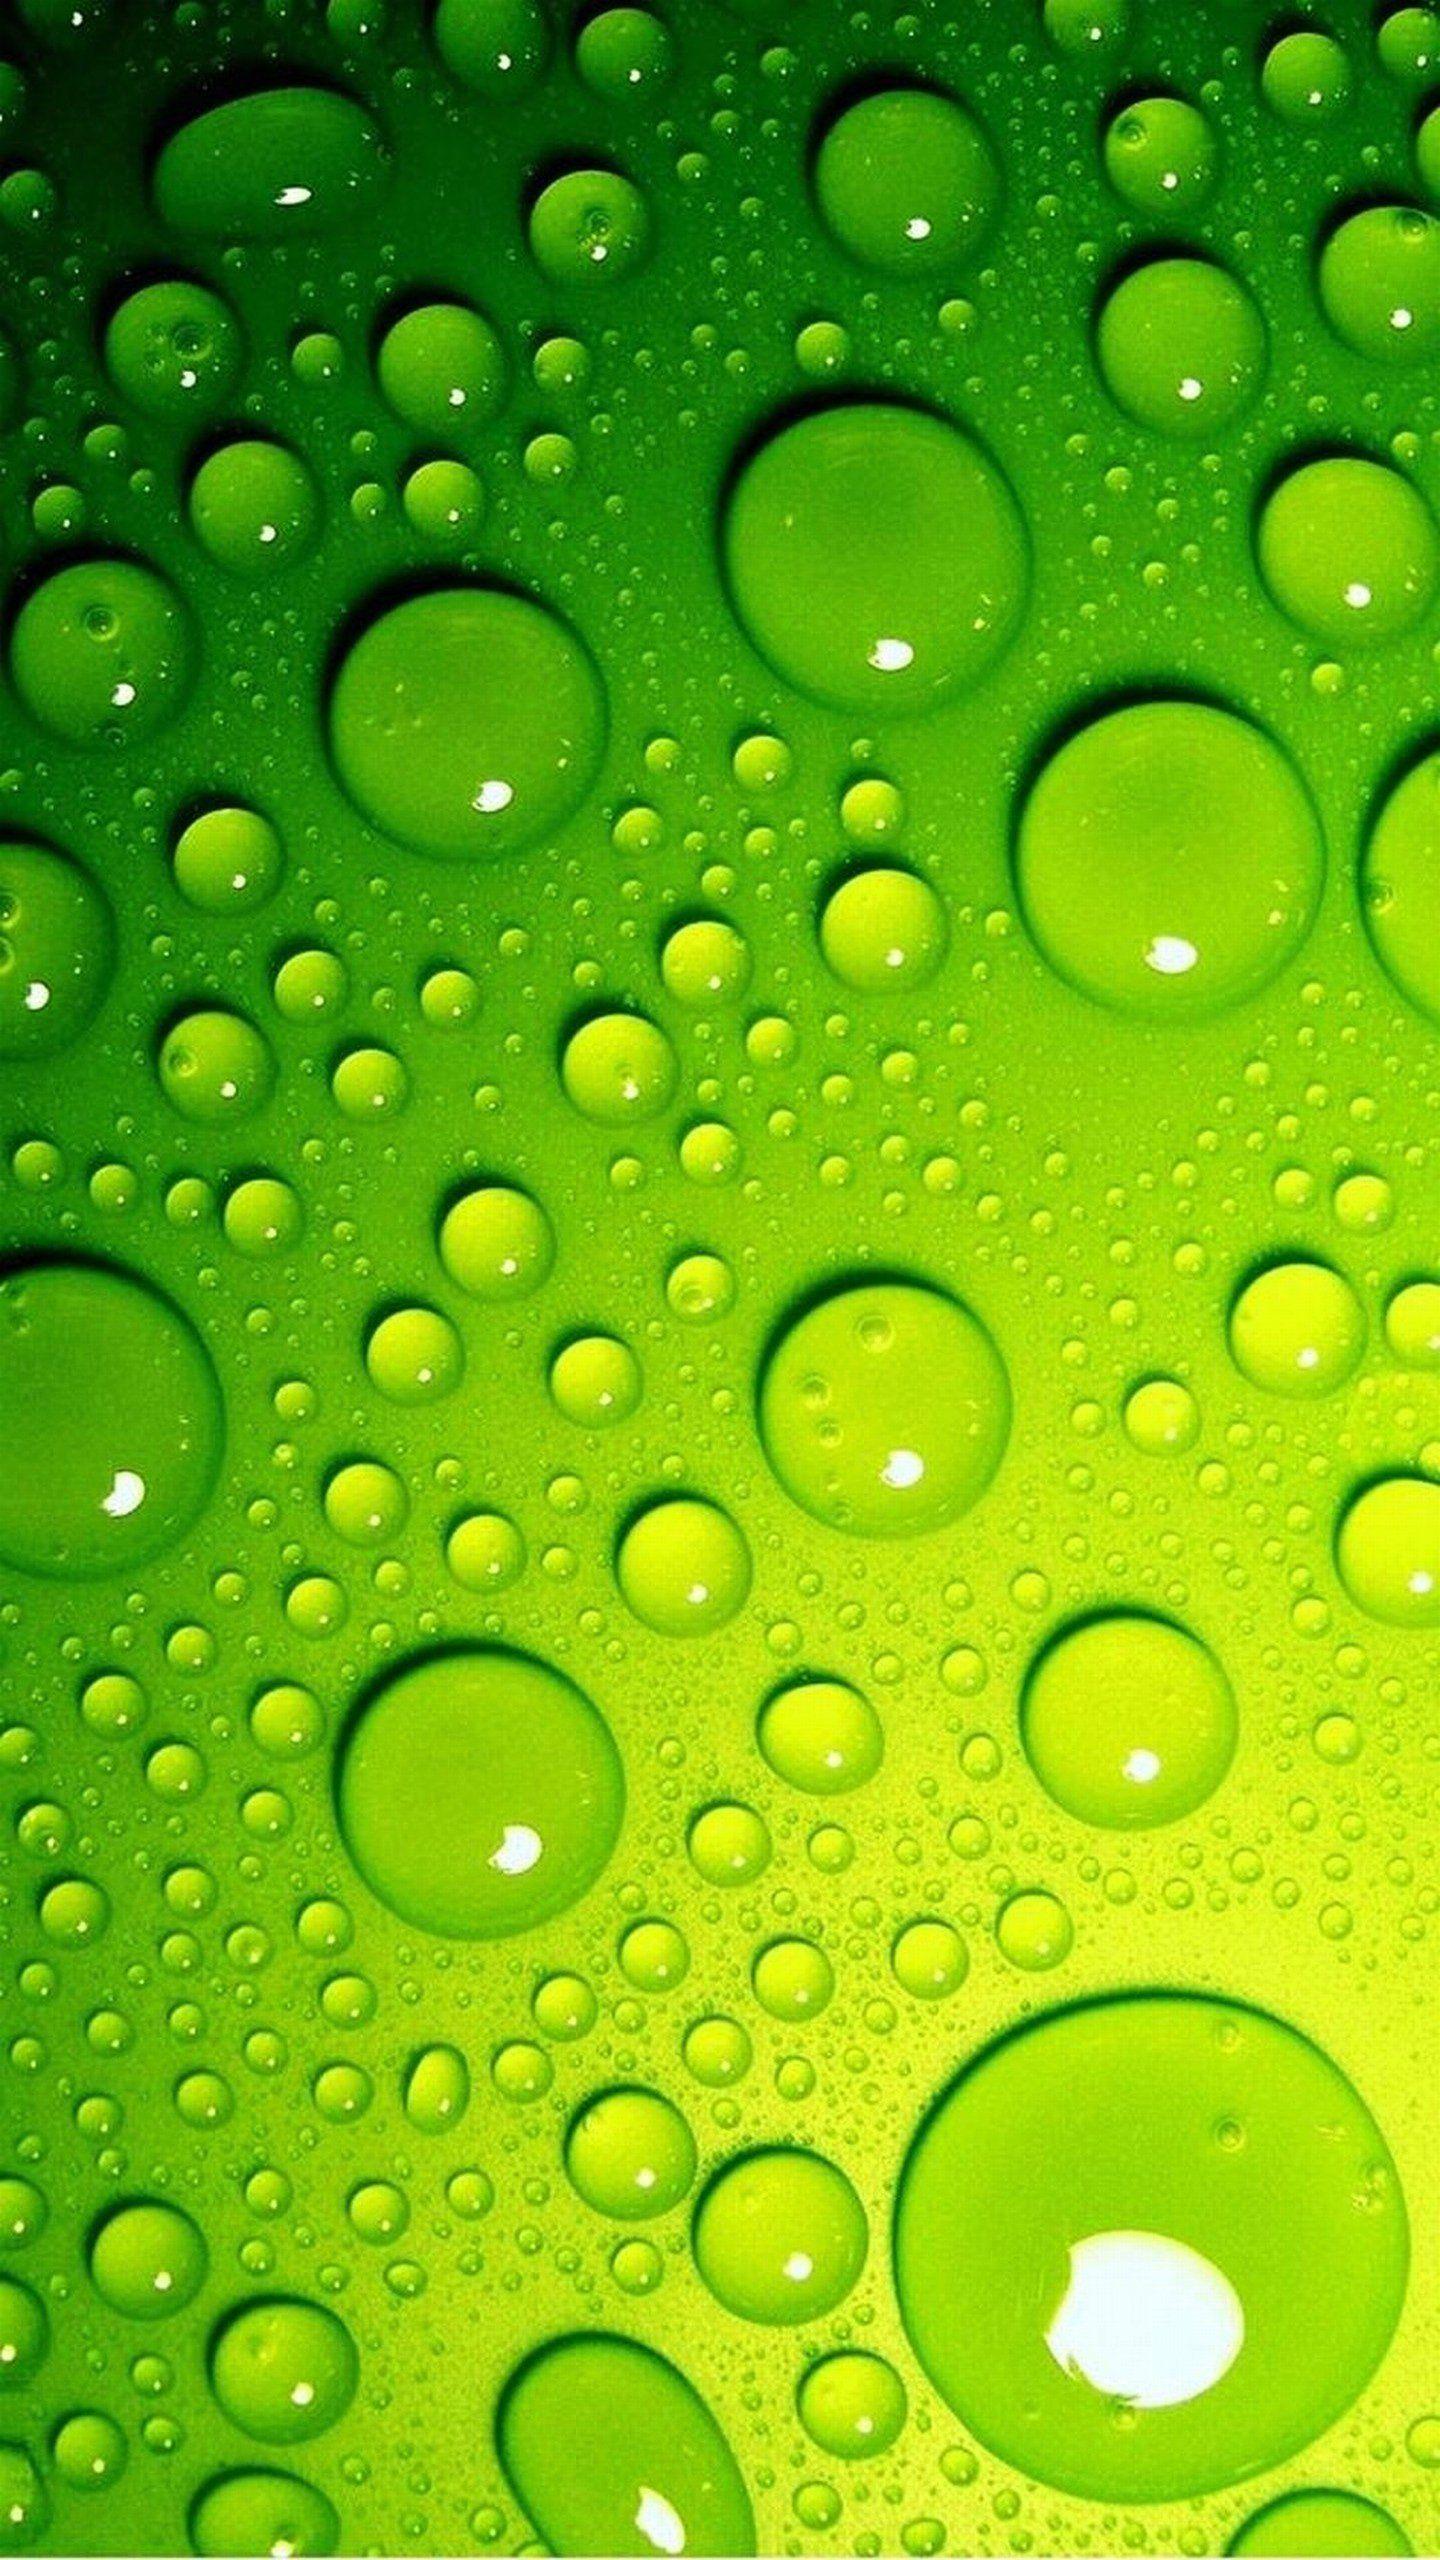 Green Drops Green Wallpaper Green Screen Photography Iphone 5s Wallpaper Hd wallpaper lime slice bubbles macro